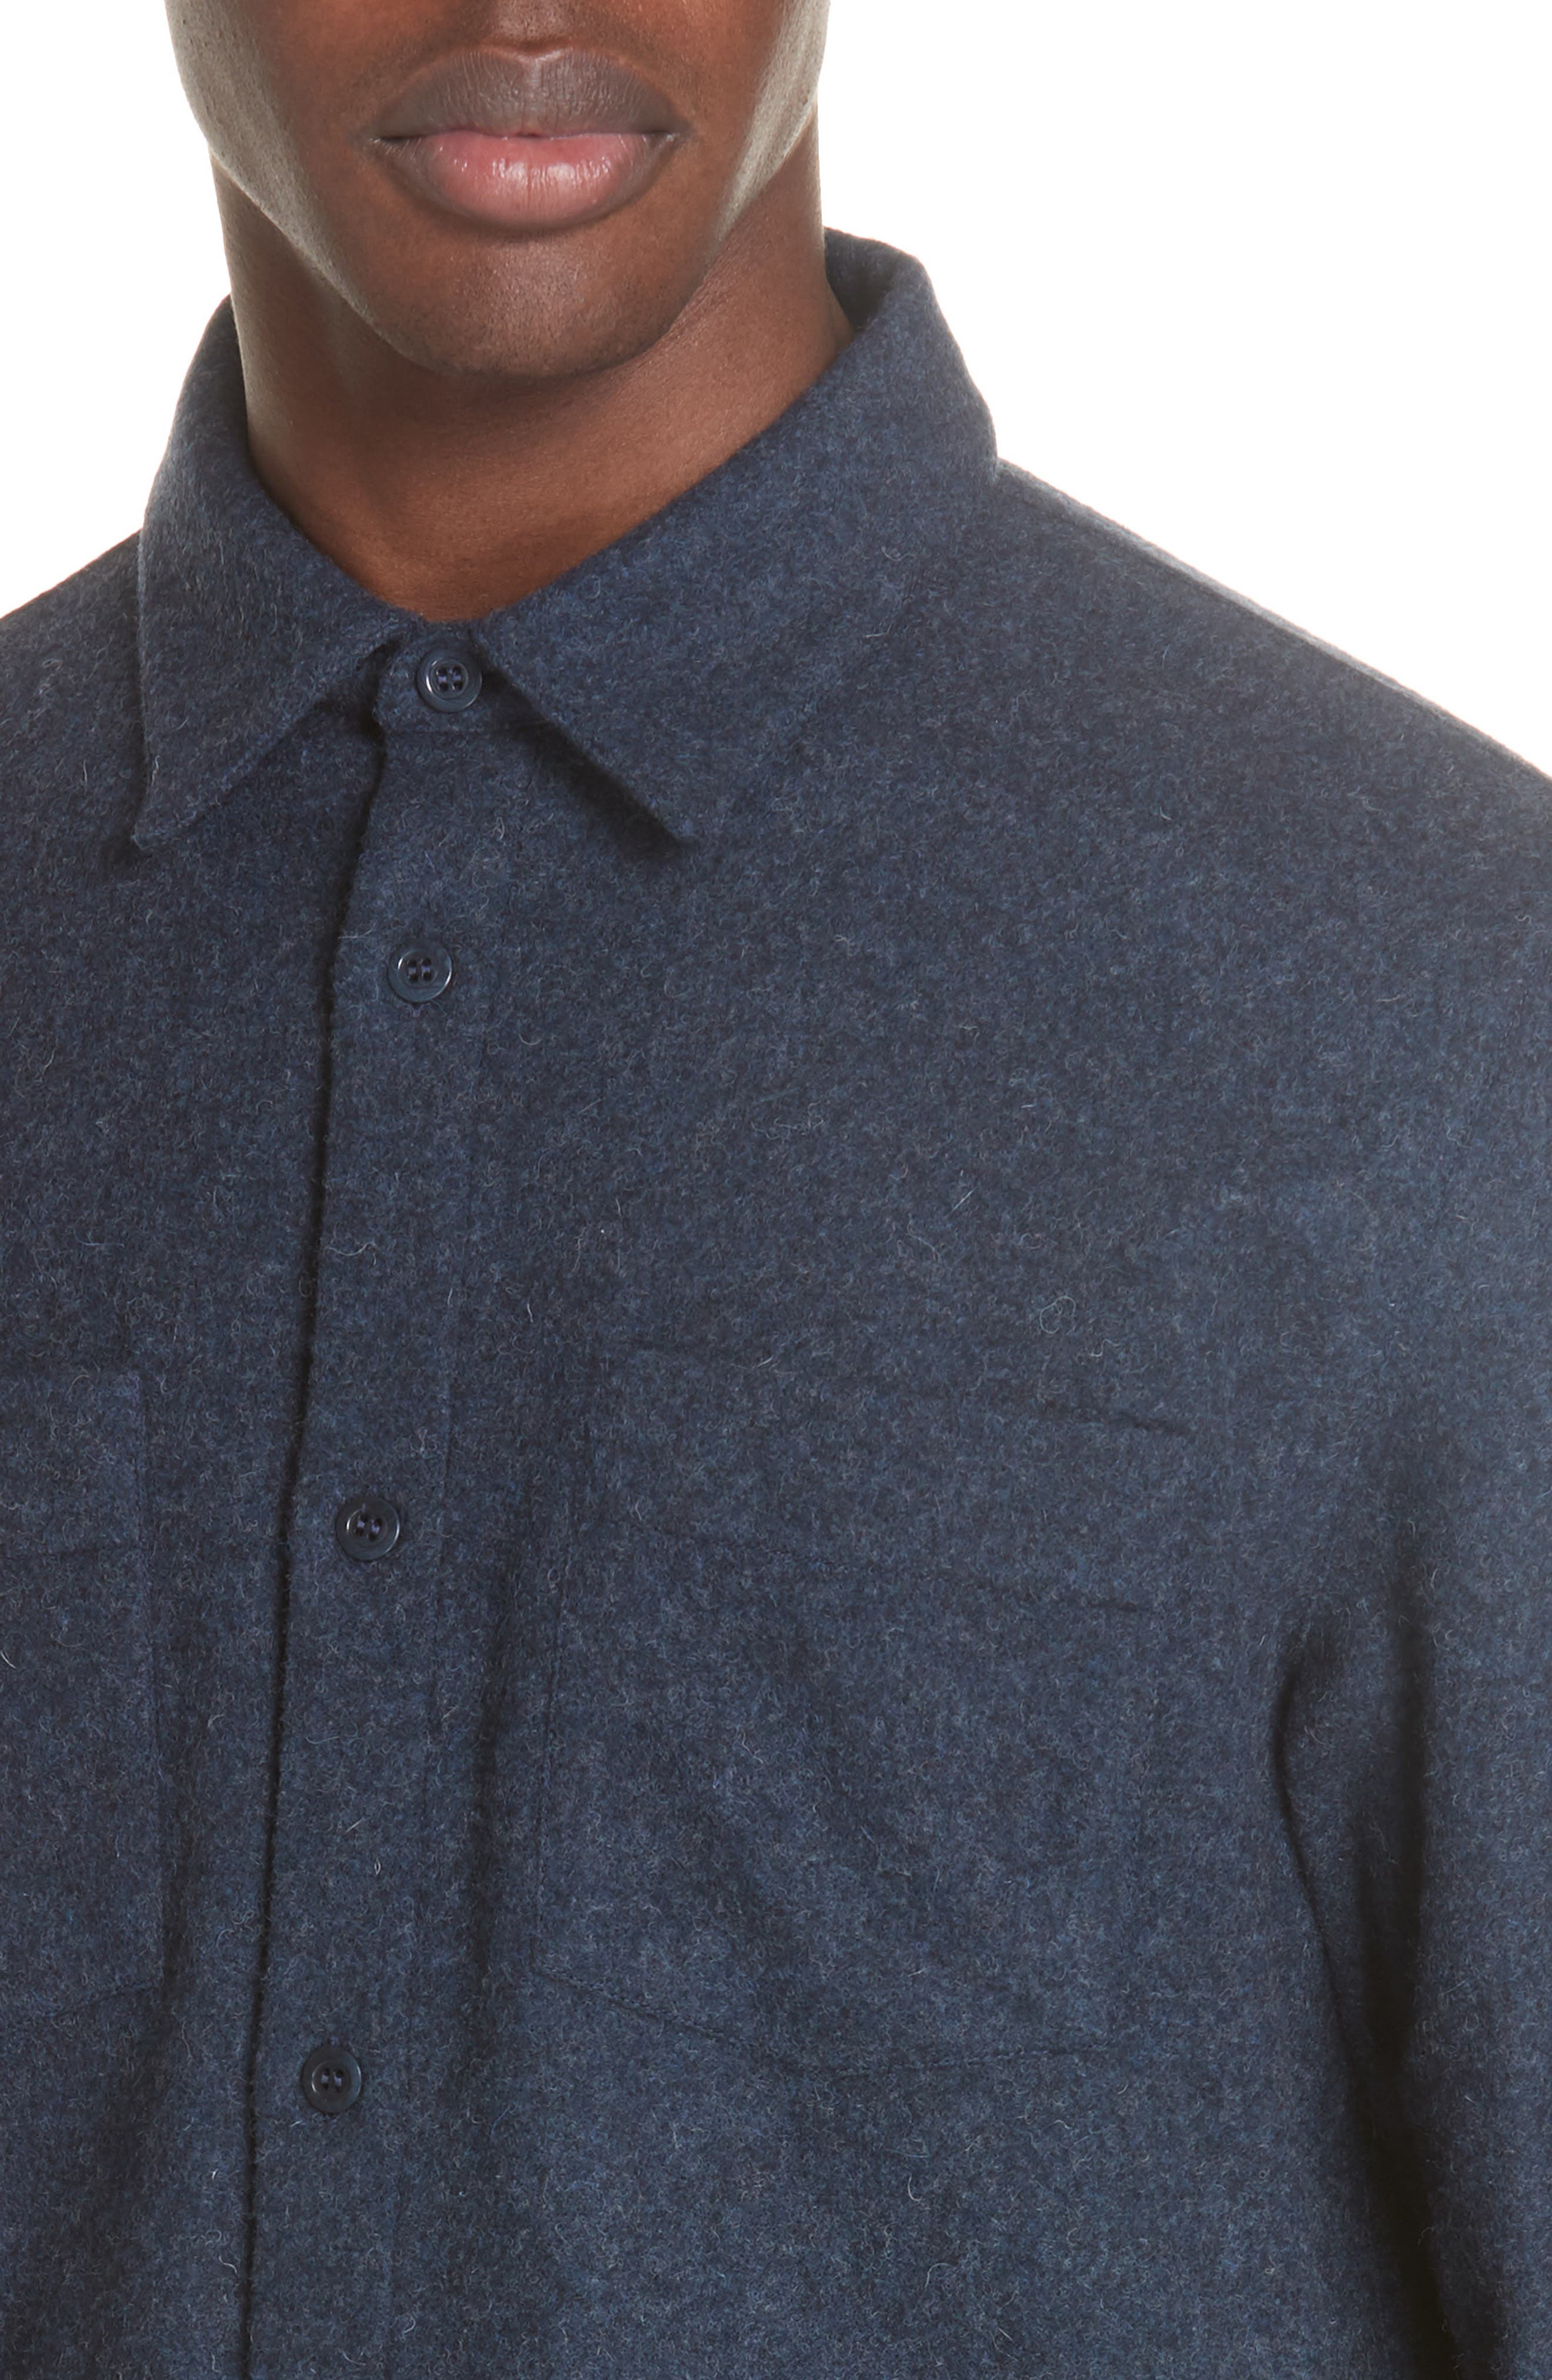 Surchemise Joe Wool Shirt,                             Alternate thumbnail 2, color,                             MARINE CHINE PIA